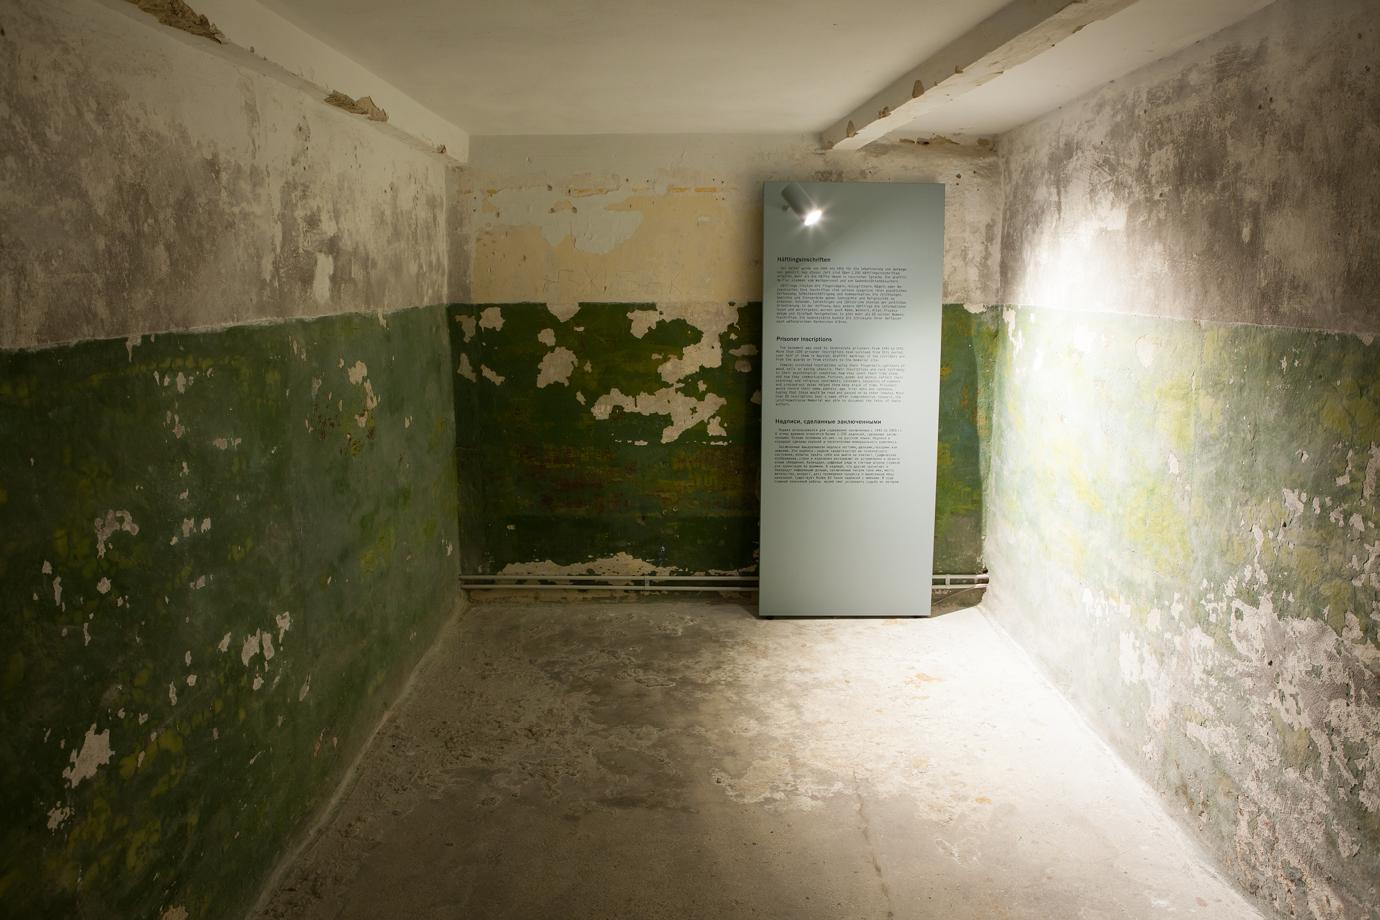 http://e-o-t.de/wordpress/wp-content/uploads/2017/04/2012_eot-Leistikow-Exhibition-13.jpg